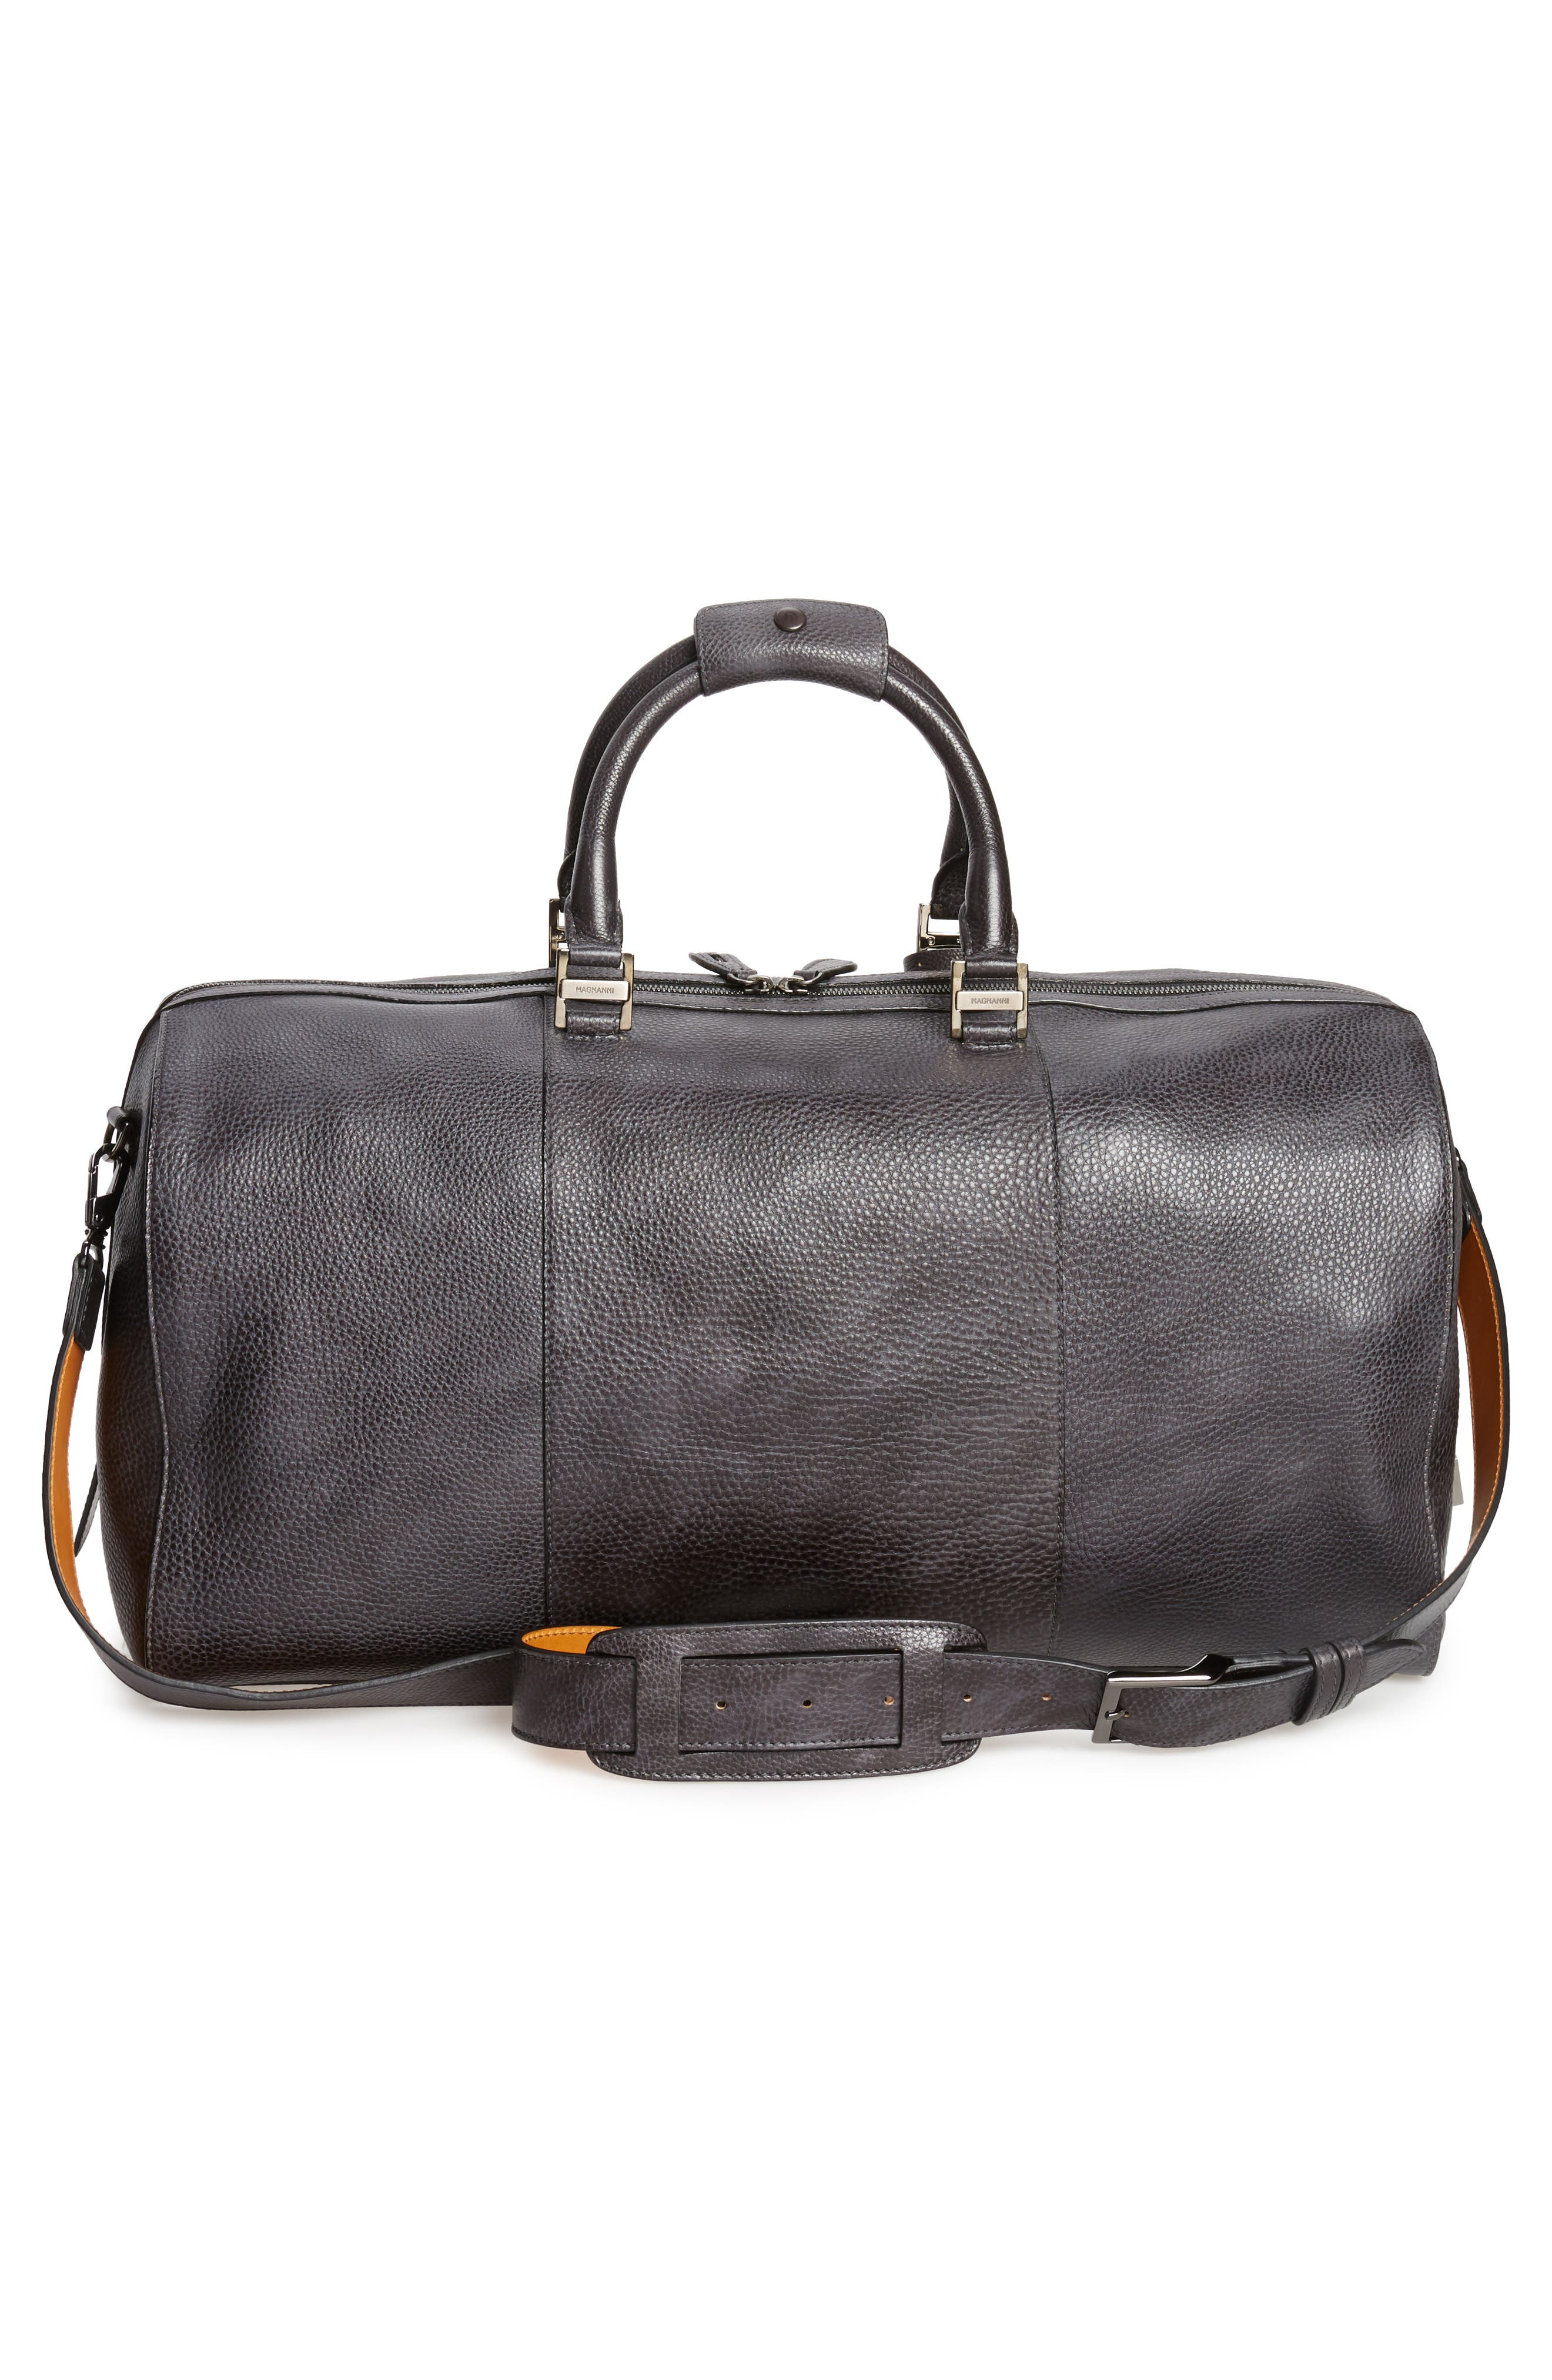 Traveler Leather Duffel Bag,                             Alternate thumbnail 3, color,                             020